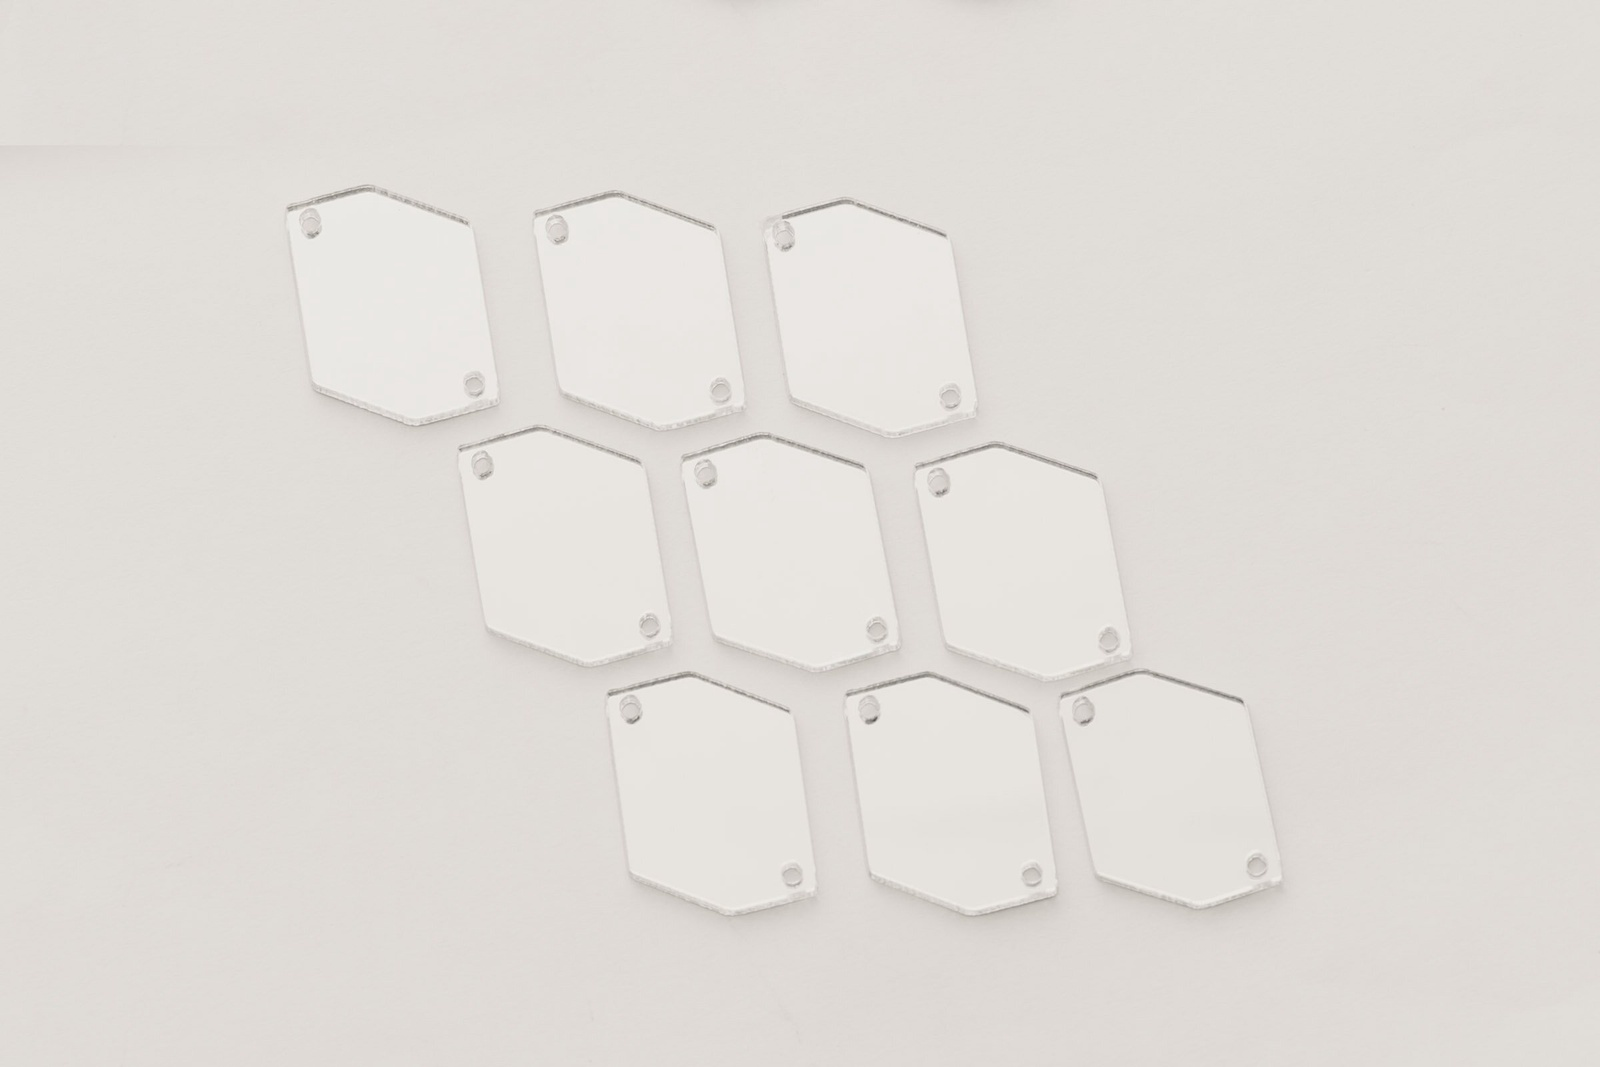 Стразы CASP Lase Шестиугольник 25х20